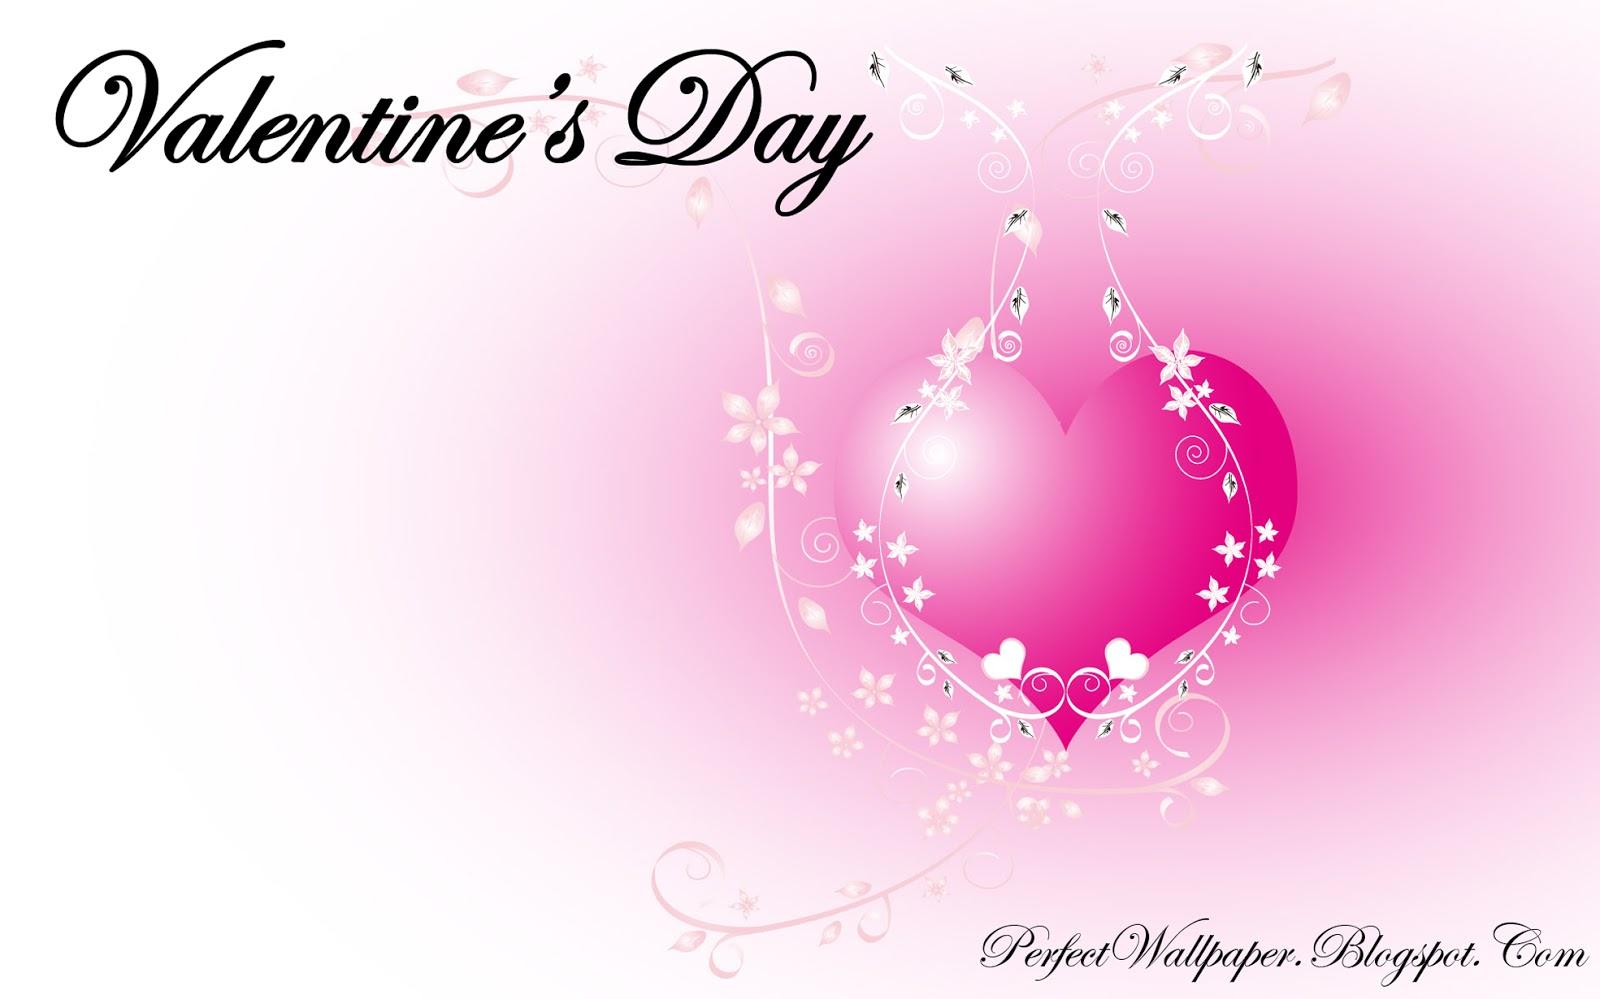 valentine 39 s day pink wallpaper perfect wallpaper. Black Bedroom Furniture Sets. Home Design Ideas